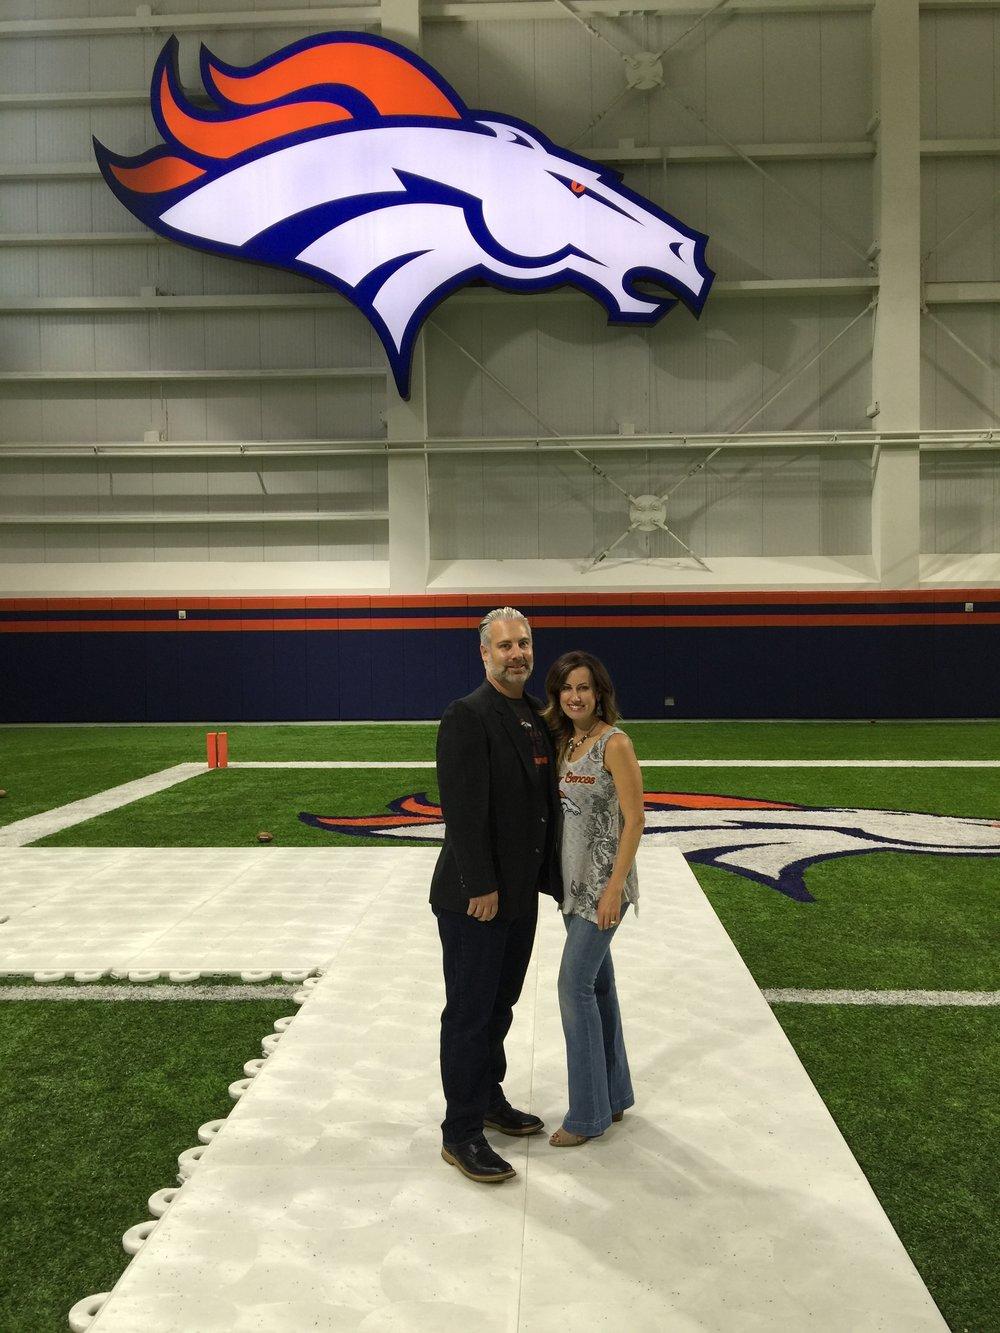 @BrigetteModglin & @JayModglin at Broncos Training Center in Dove Valley